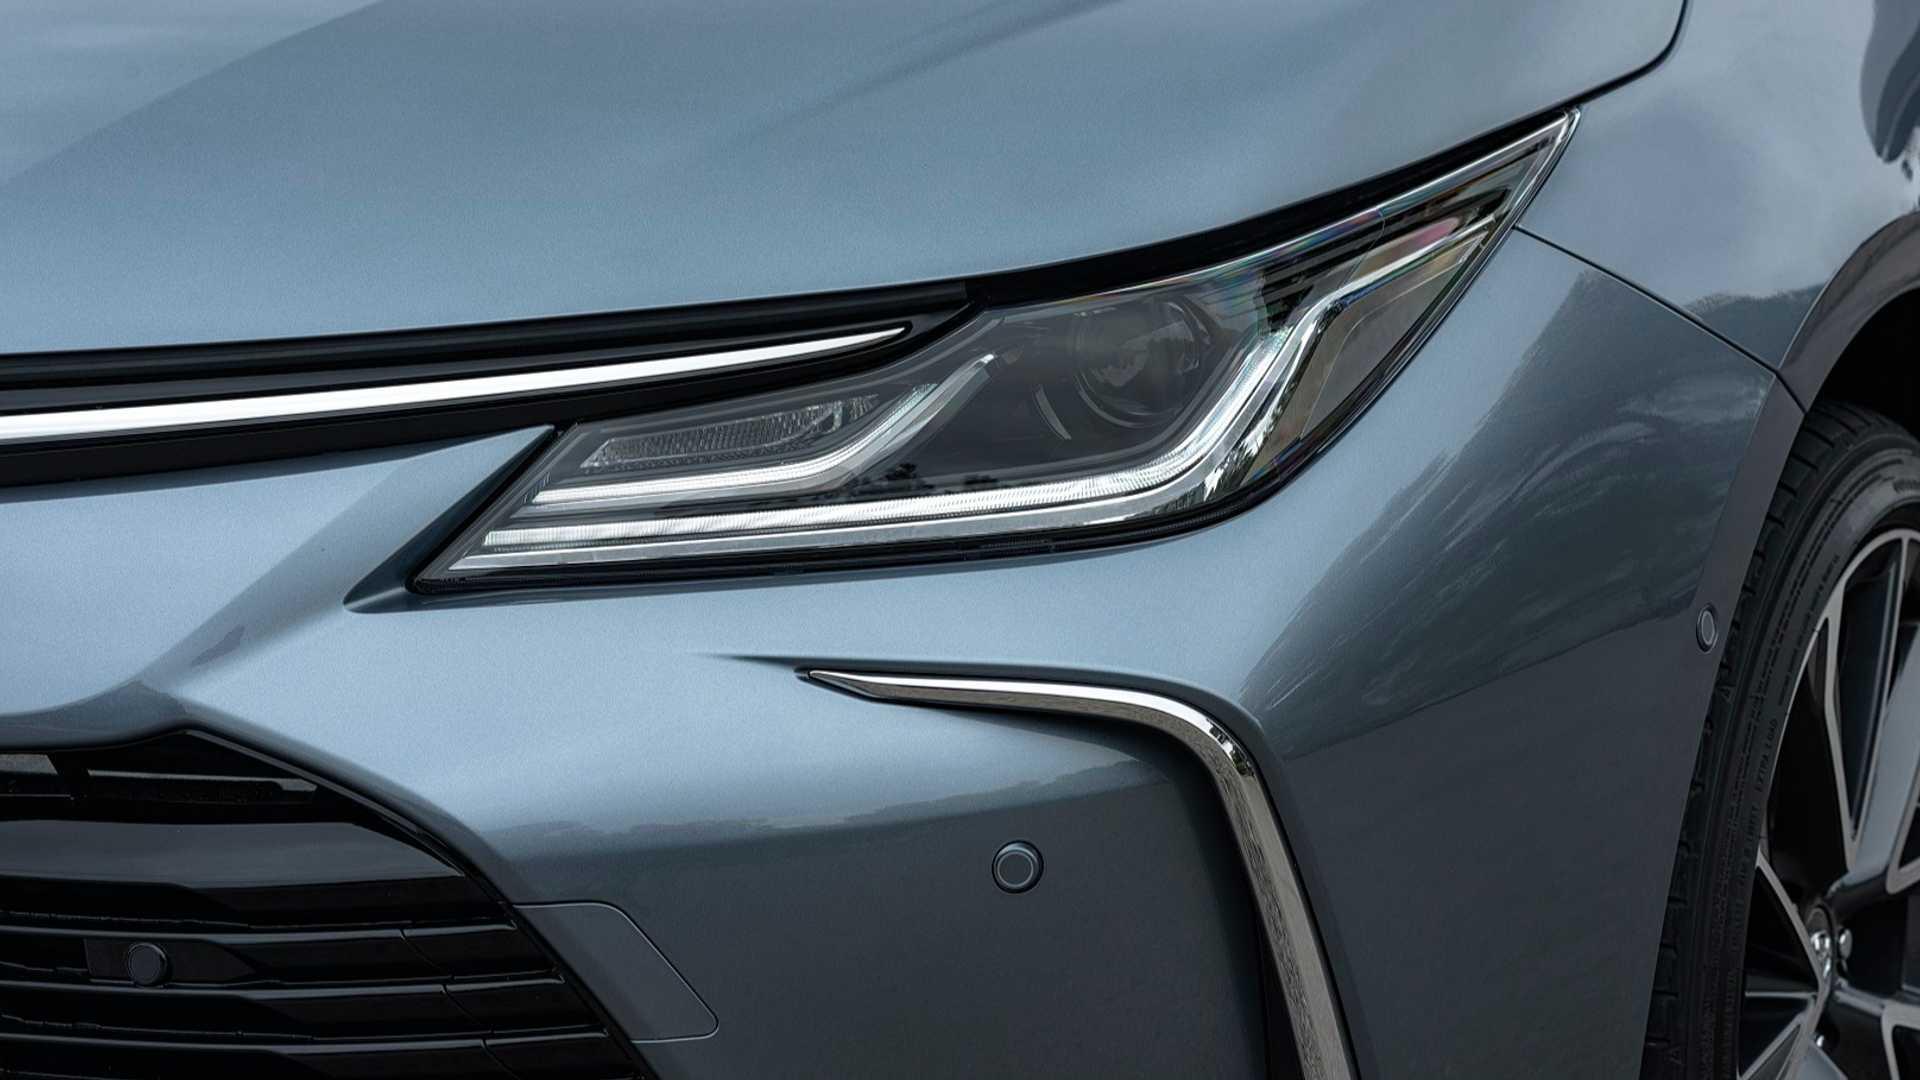 2019-toyota-corolla-hybrid-sedan (5)